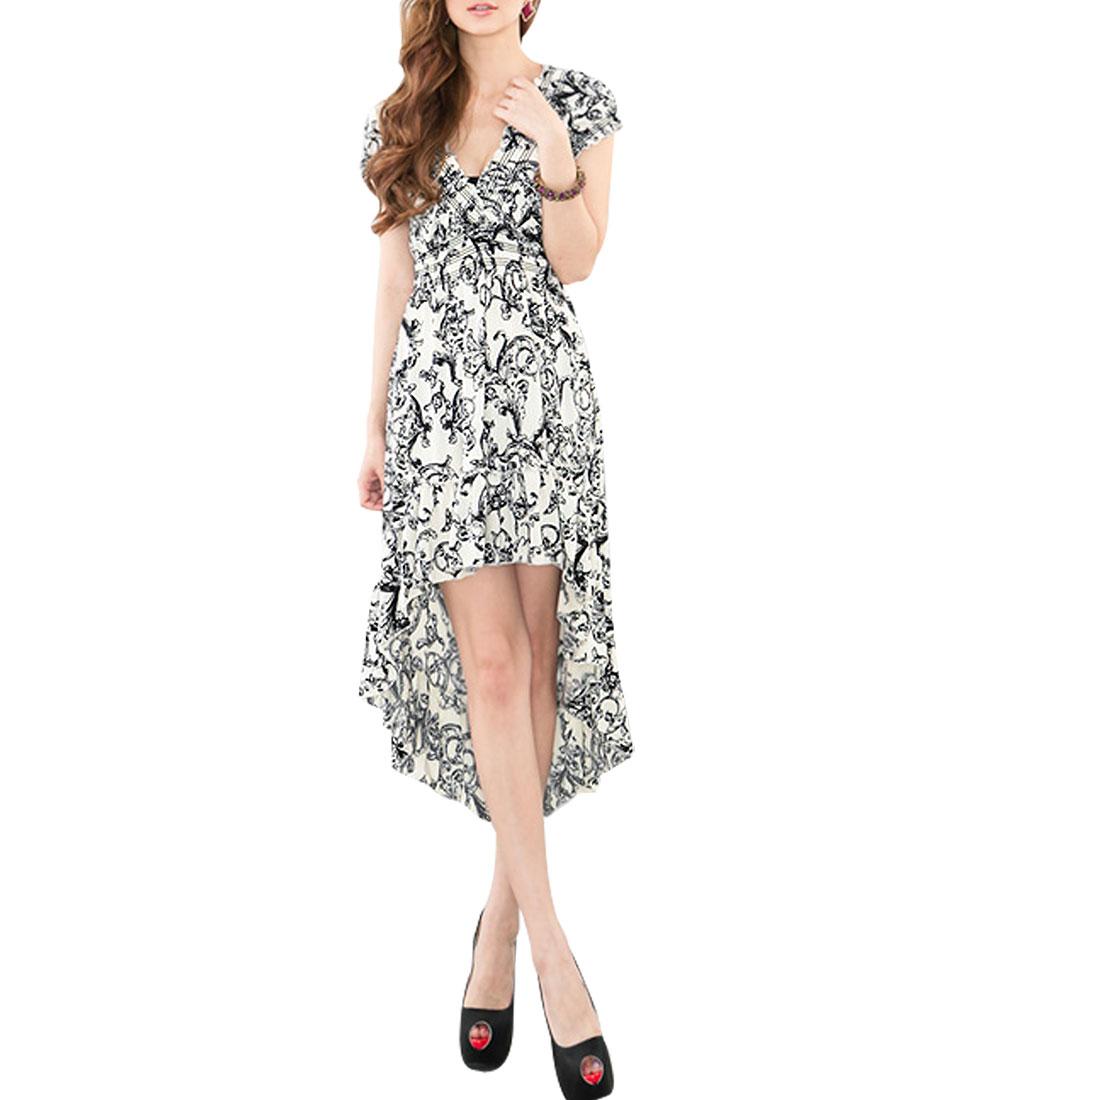 Cap Sleeveless Black Swirl Flowers Pattern White Empire Dress XS for Ladies